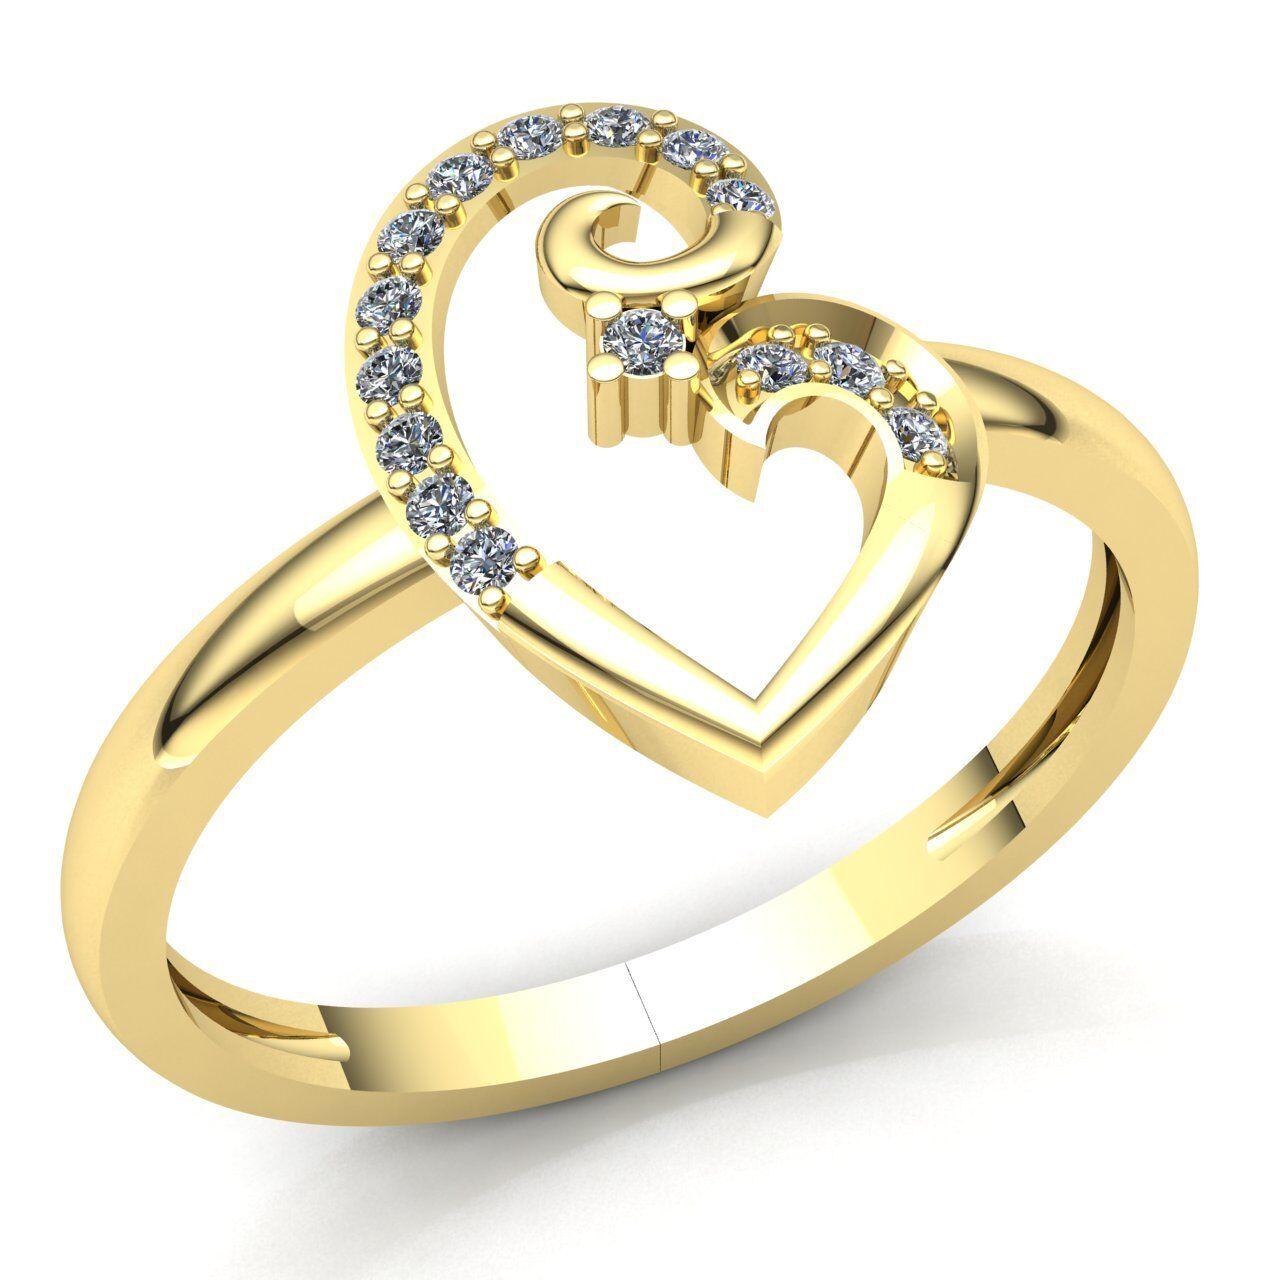 3a968eb506128 Fancy Diamond Cut Round 0.15ct Anniversary Ladies gold 10K Ring ...